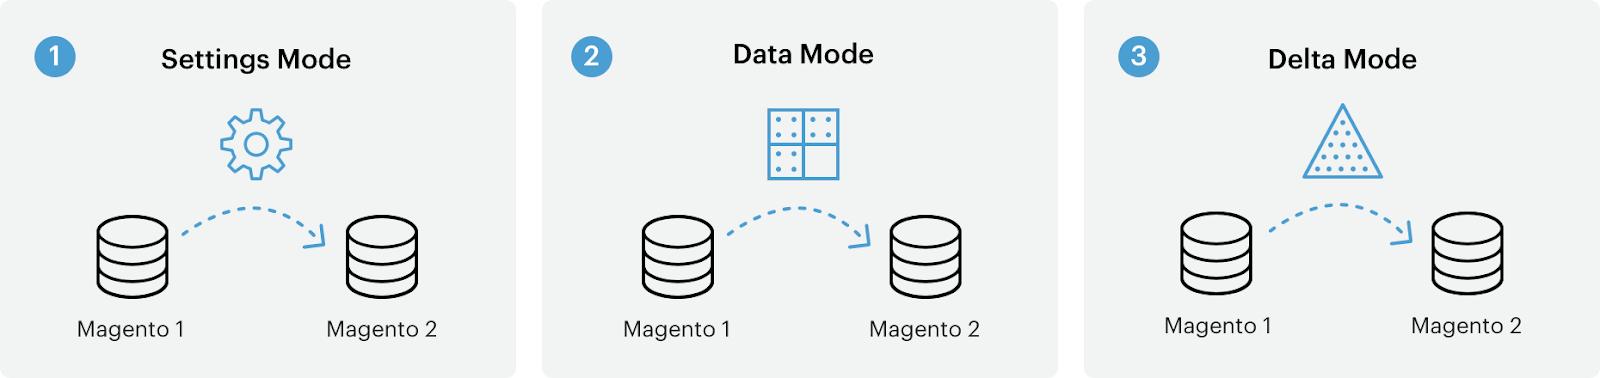 Magento migration modes